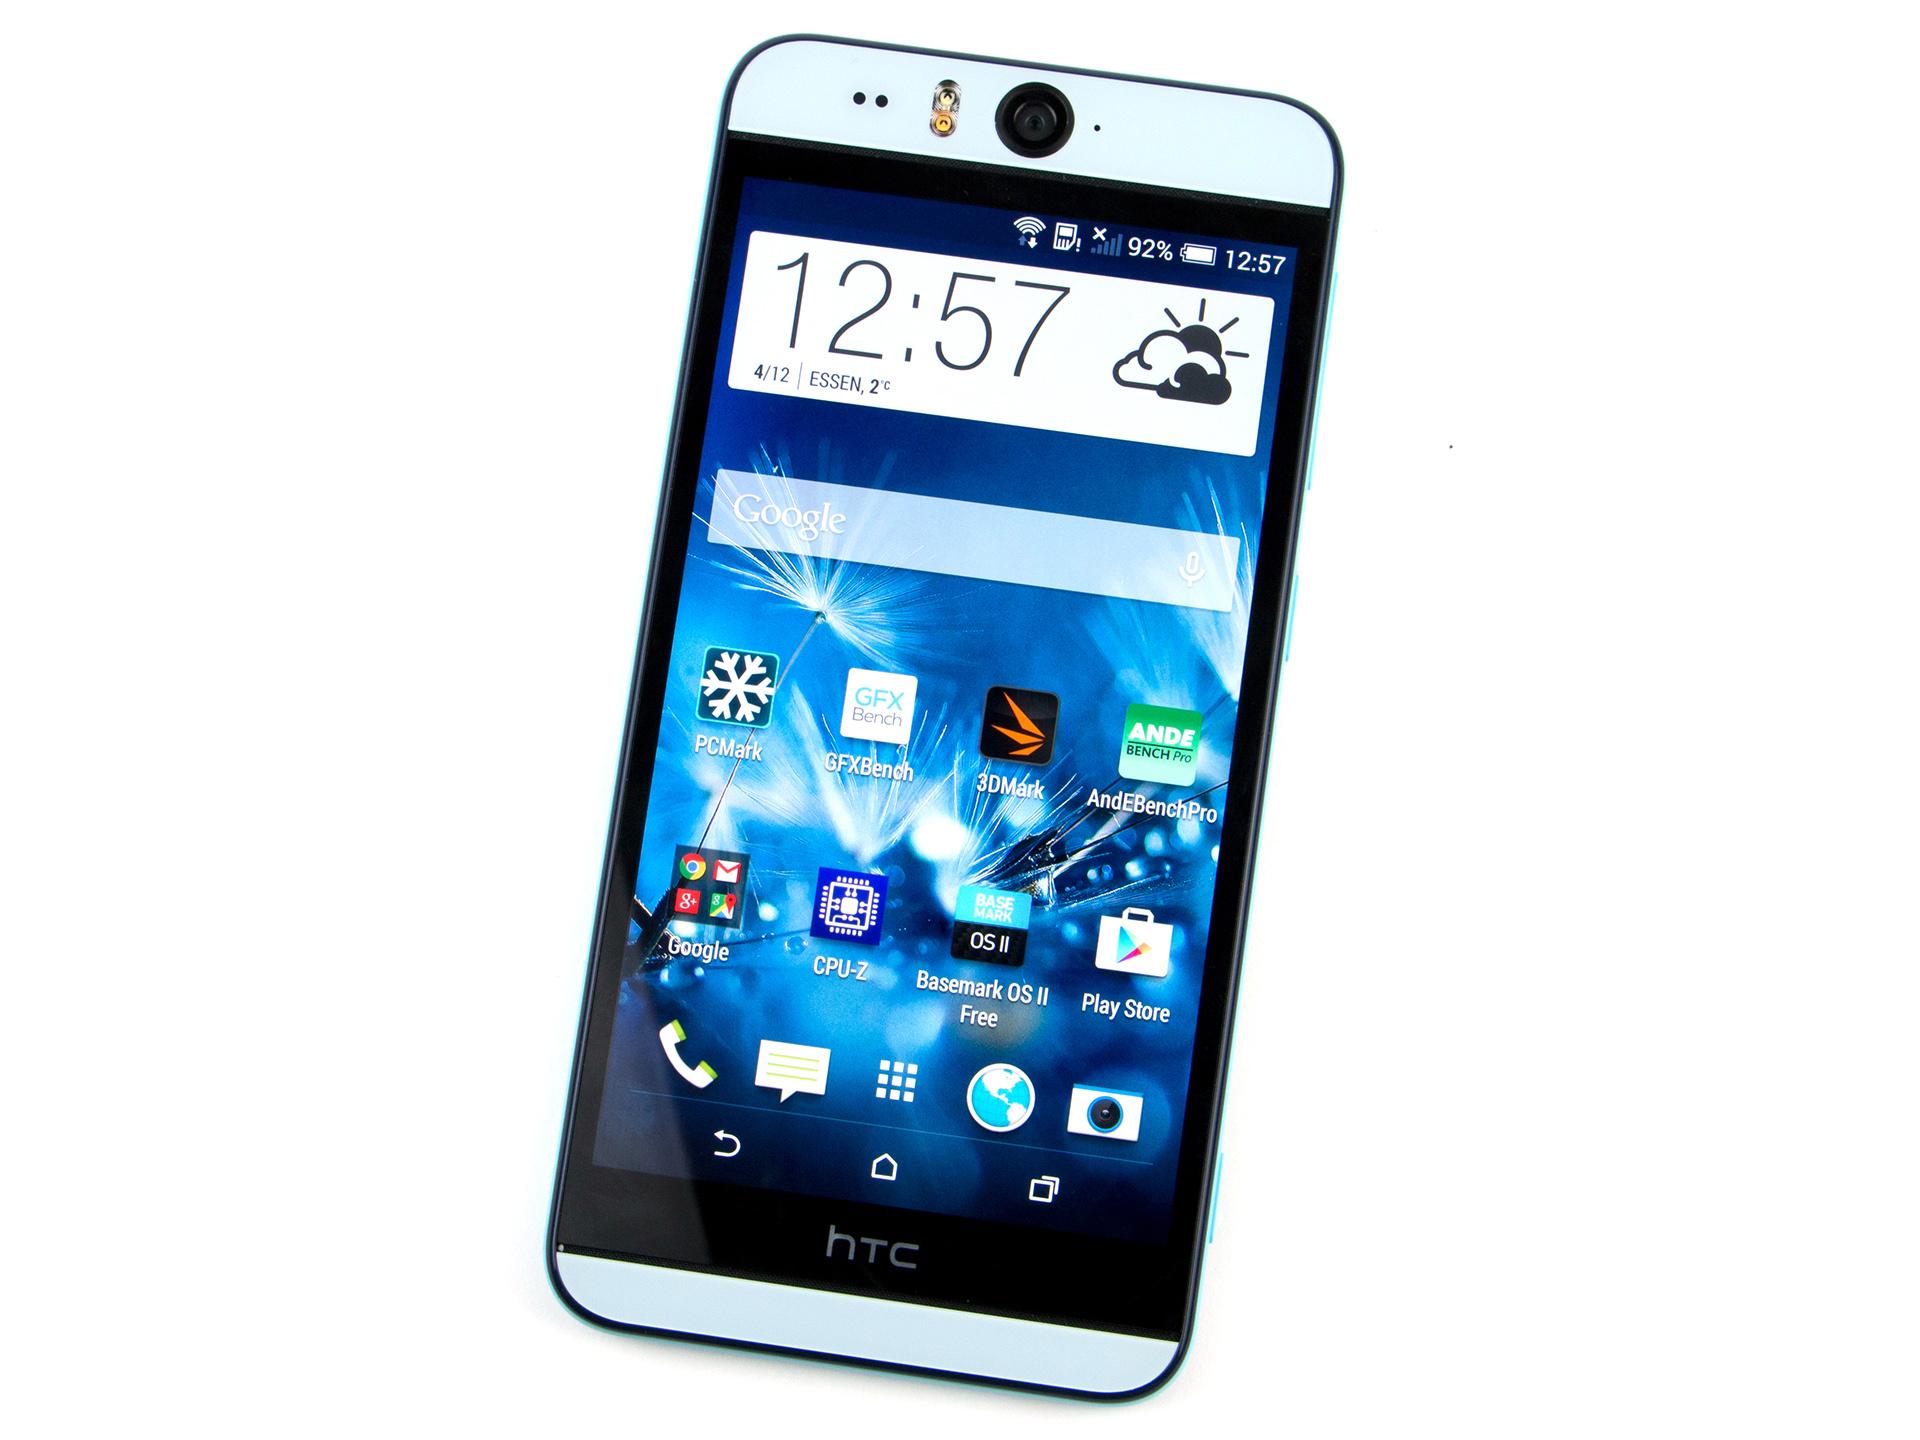 b6542a0957f HTC Desire Eye Smartphone Review - NotebookCheck.net Reviews